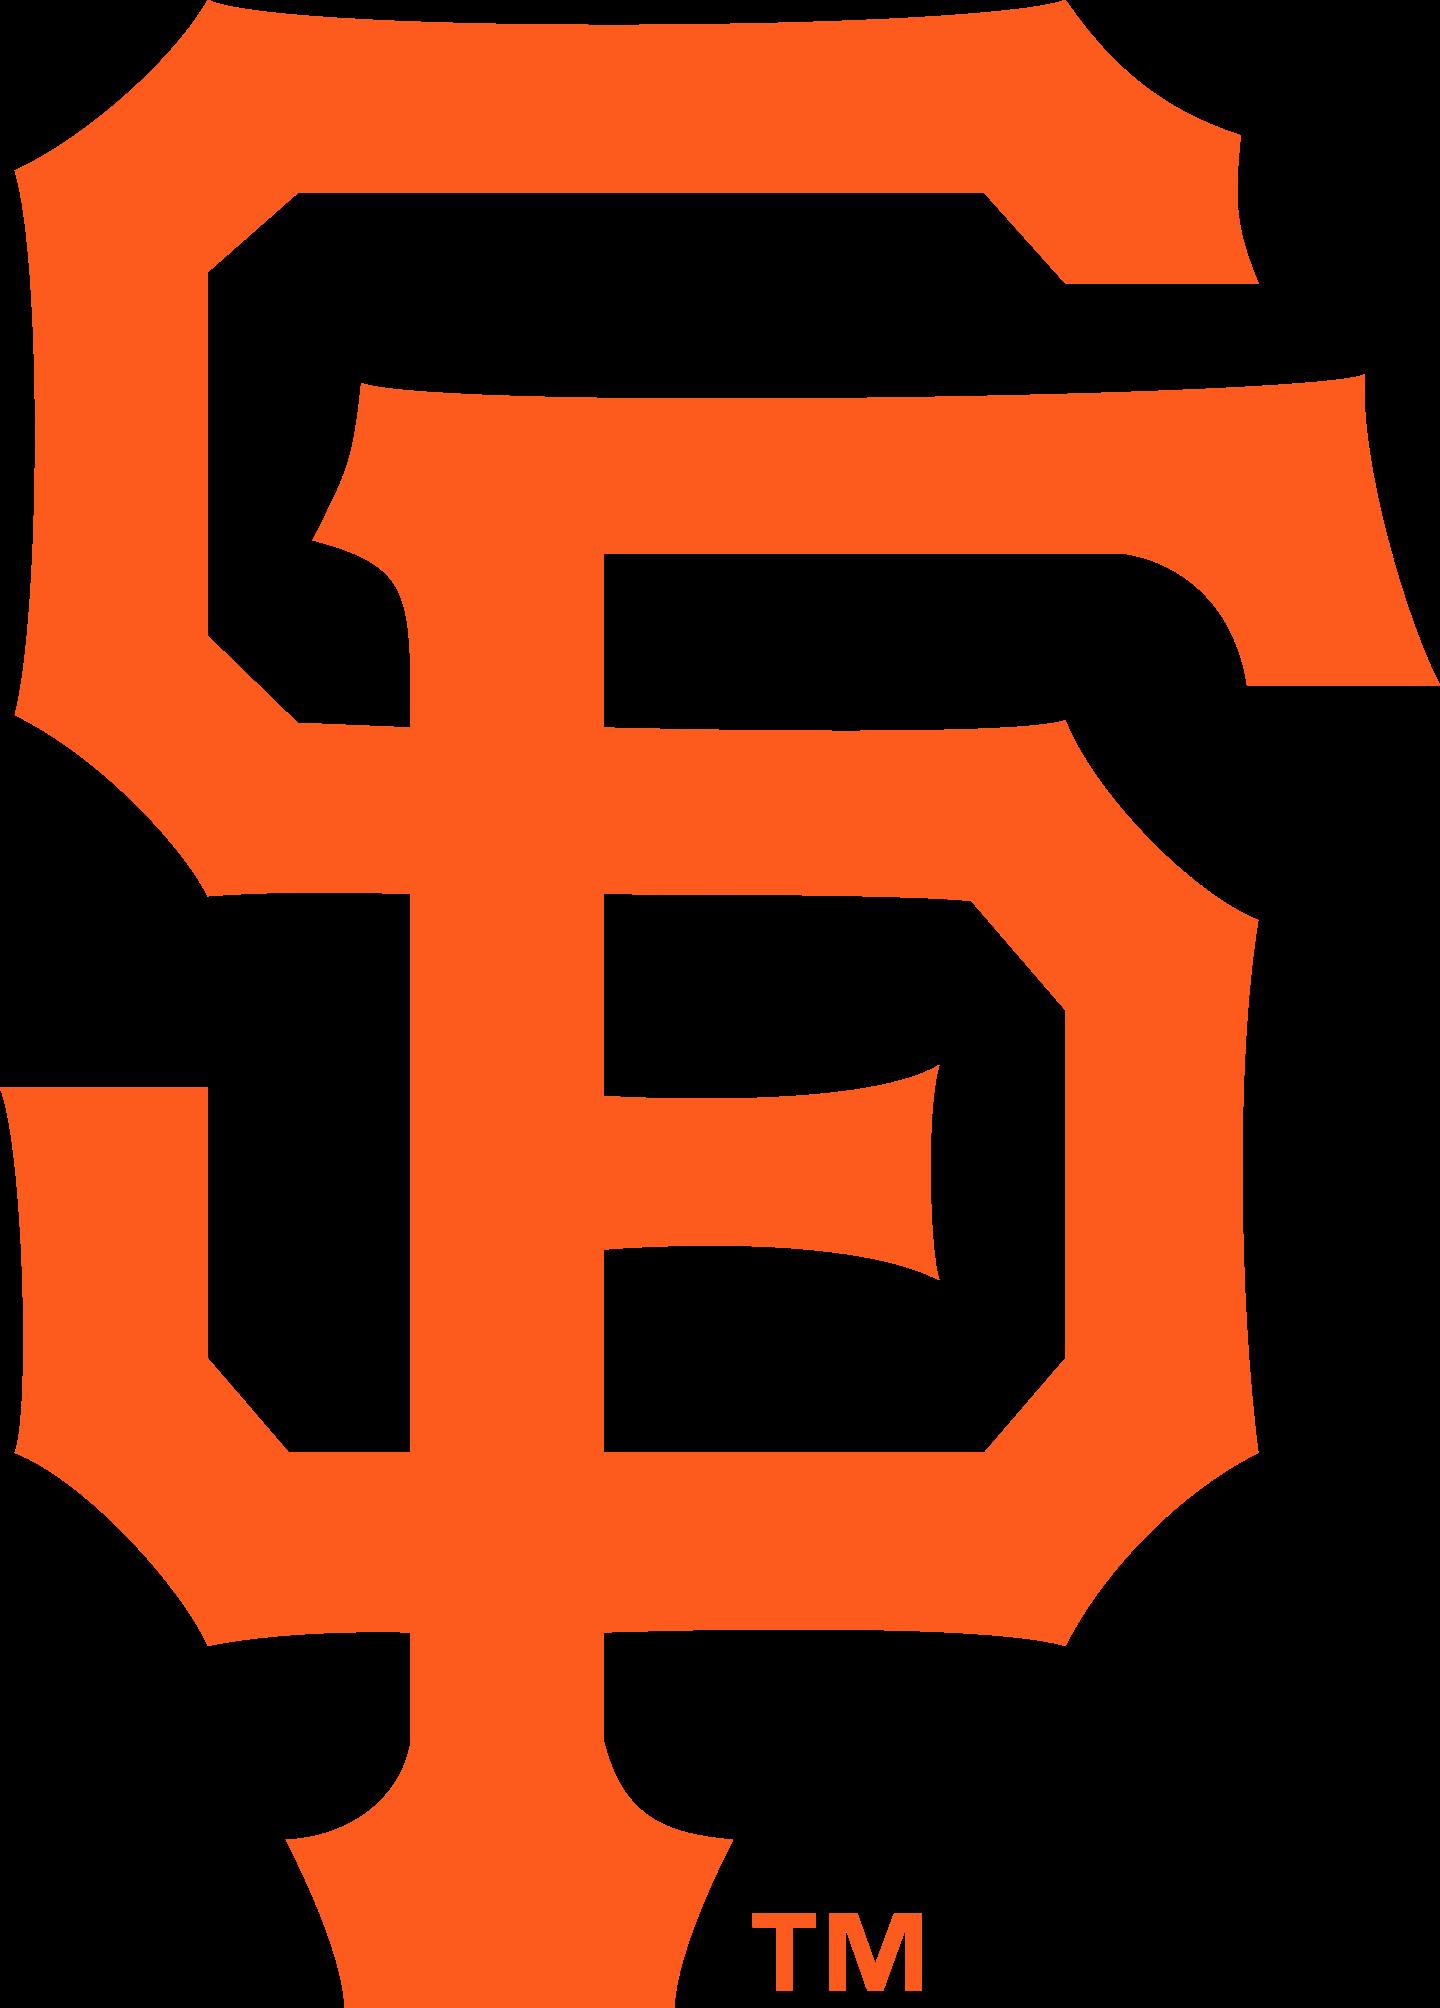 san francisco giants logo 2 - San Francisco Giants Logo